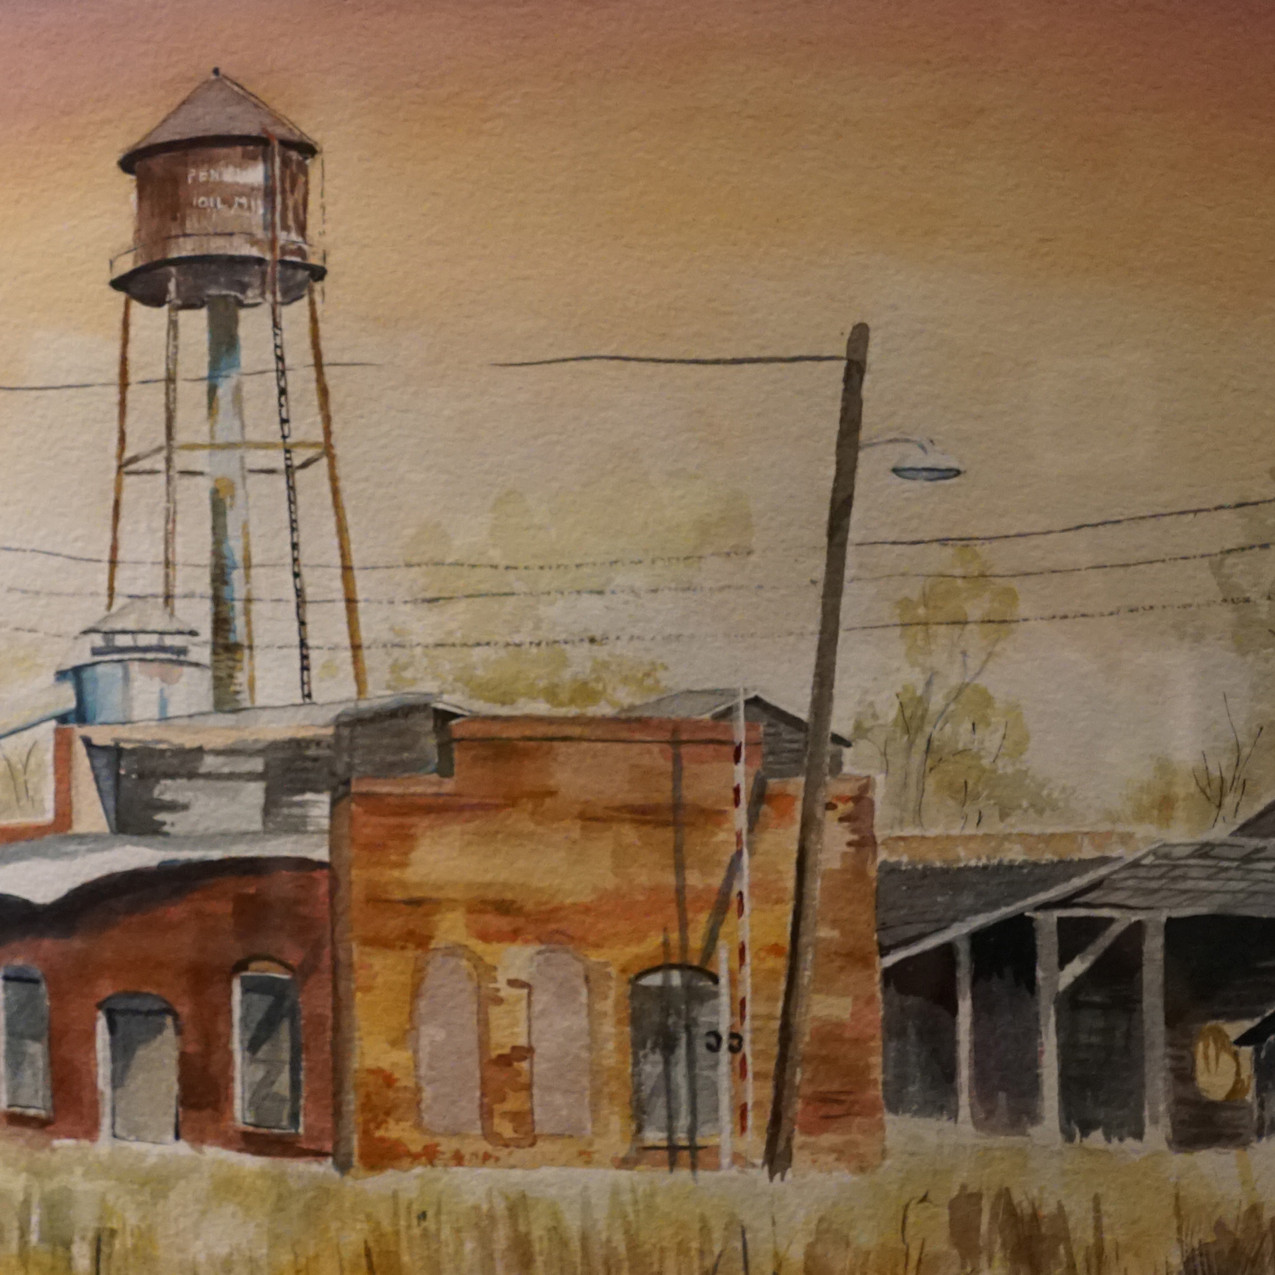 Pendleton Oil Mill by Jane Friedman wate